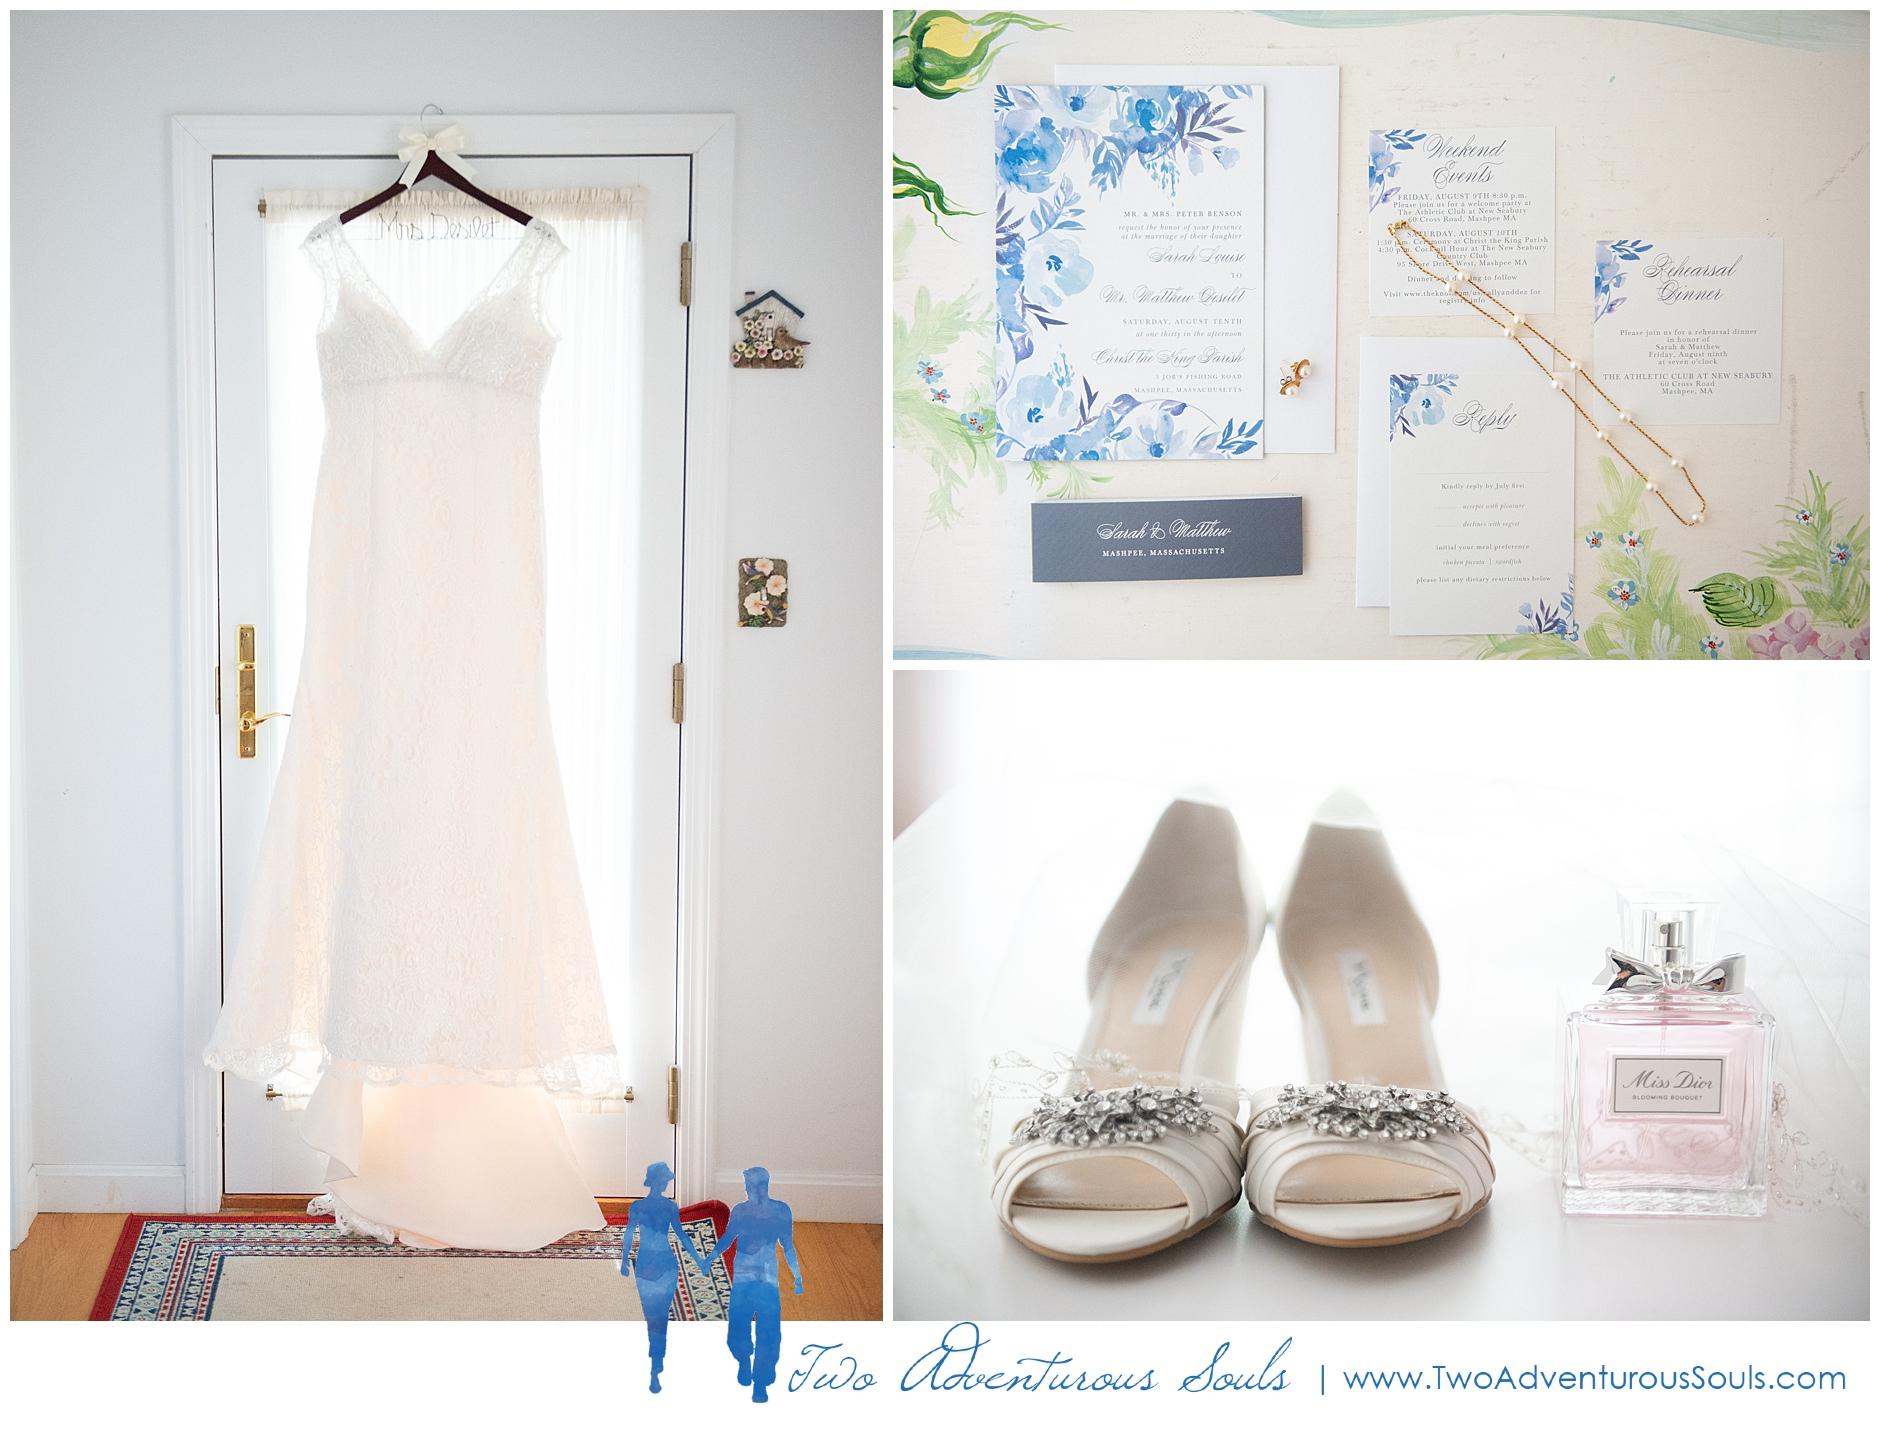 Cape Cod Wedding Photographers, Destination Wedding Photographers, Two Adventurous Souls-081019_0003.jpg